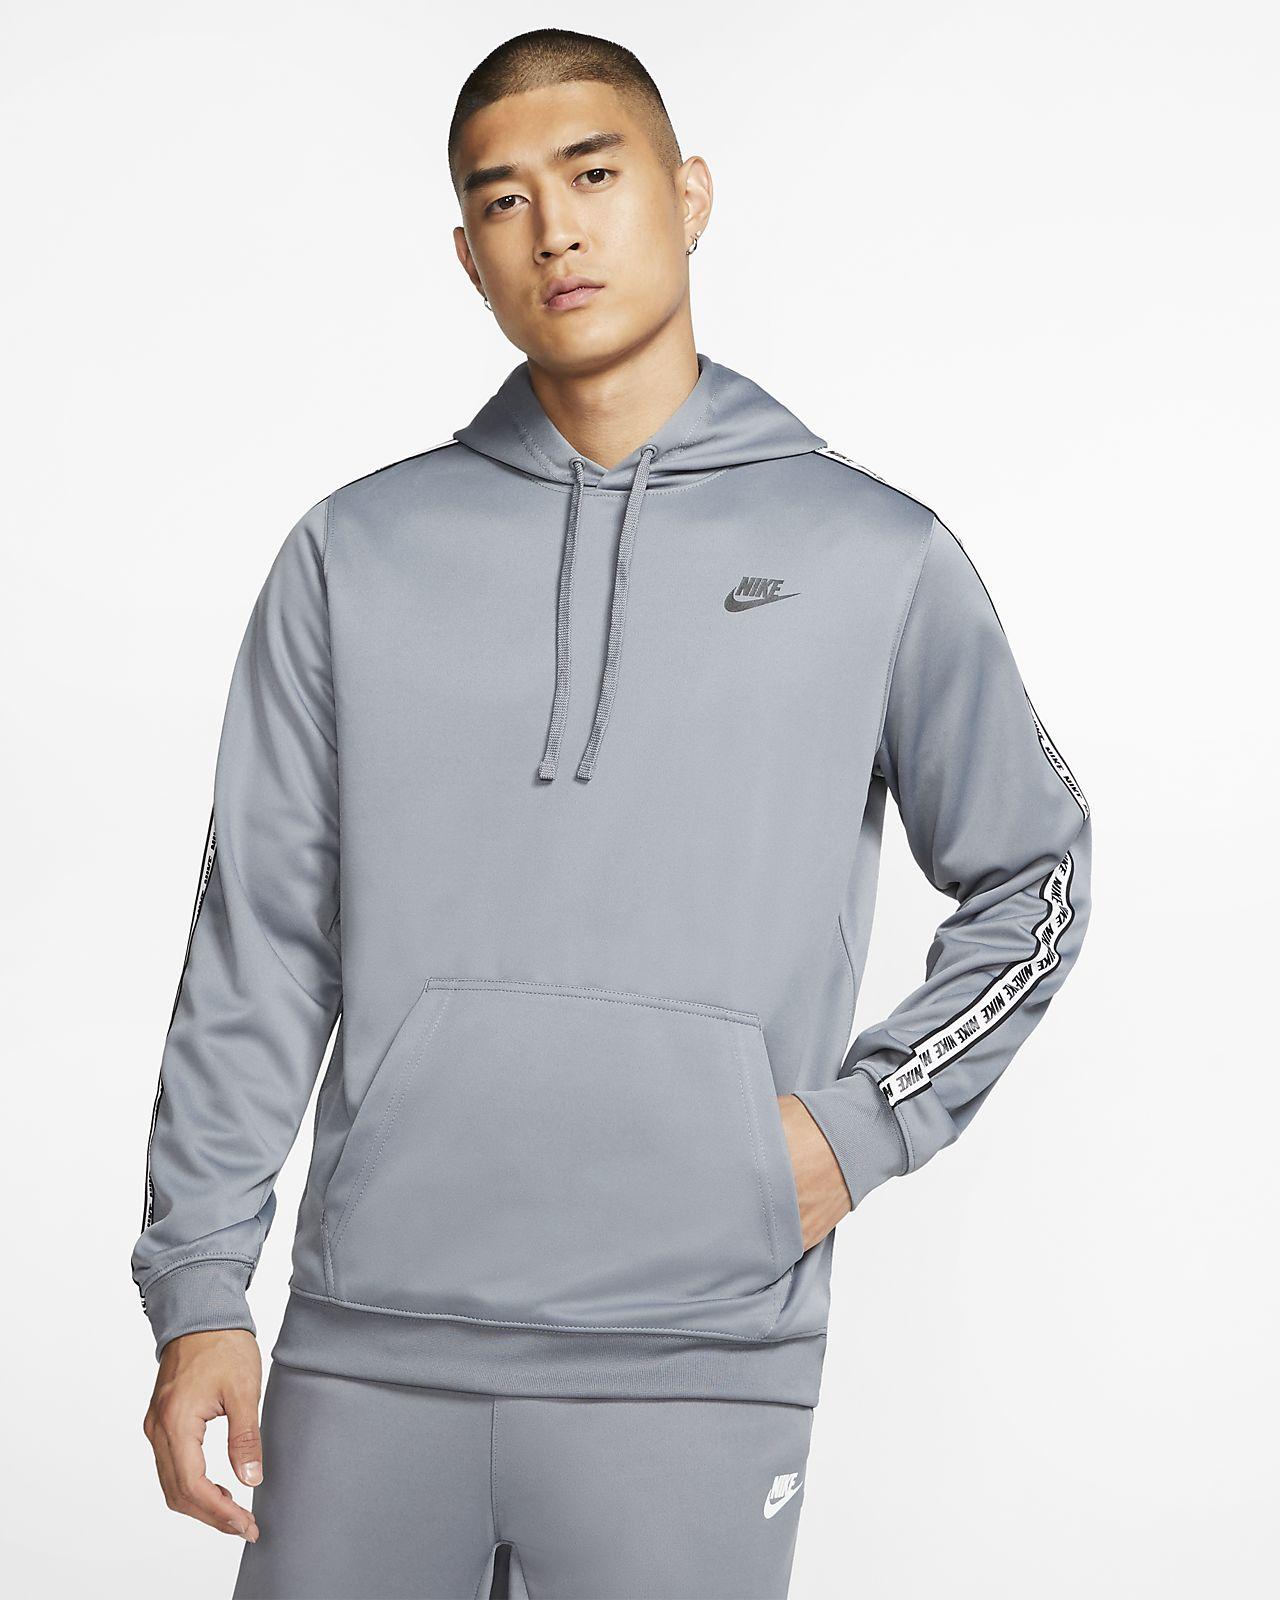 sweat à capuche pour homme nike sportswear